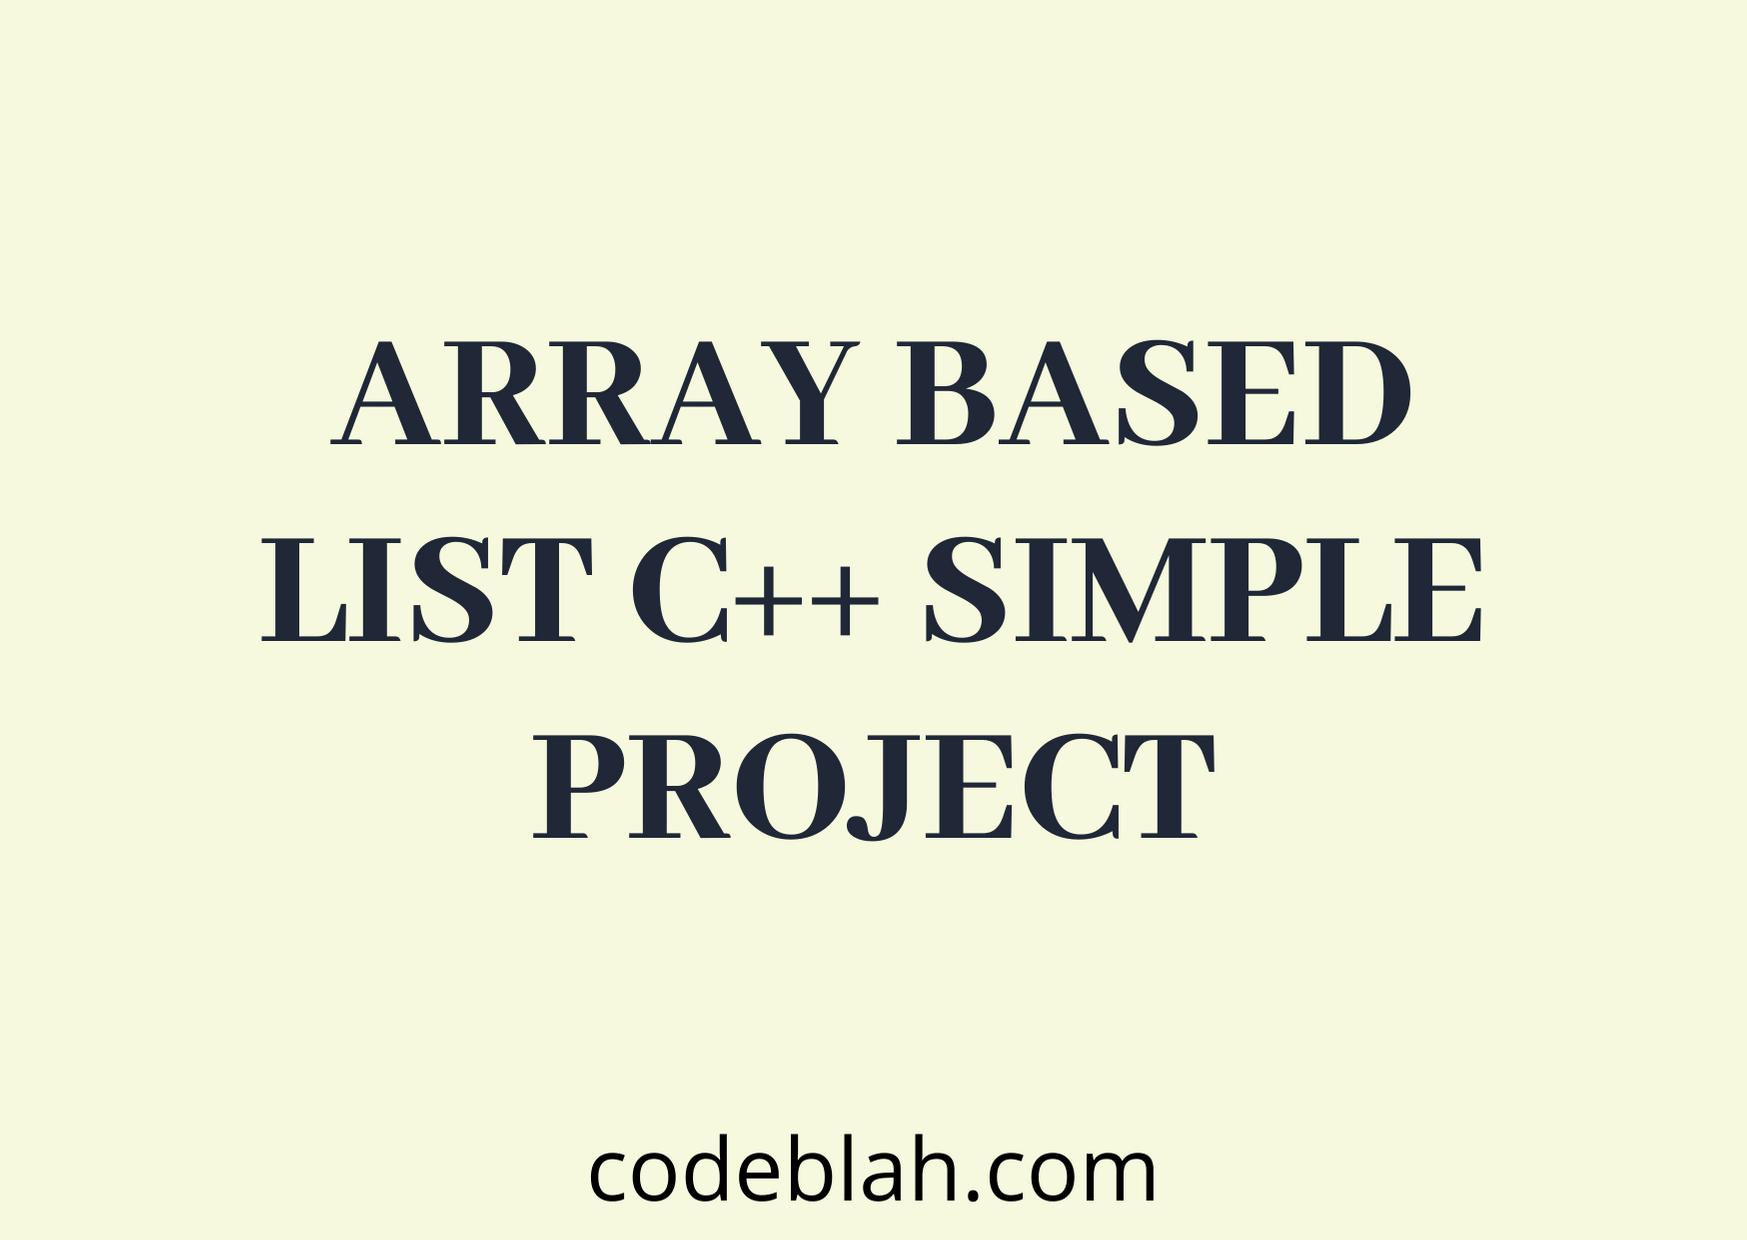 C++ Array Based List